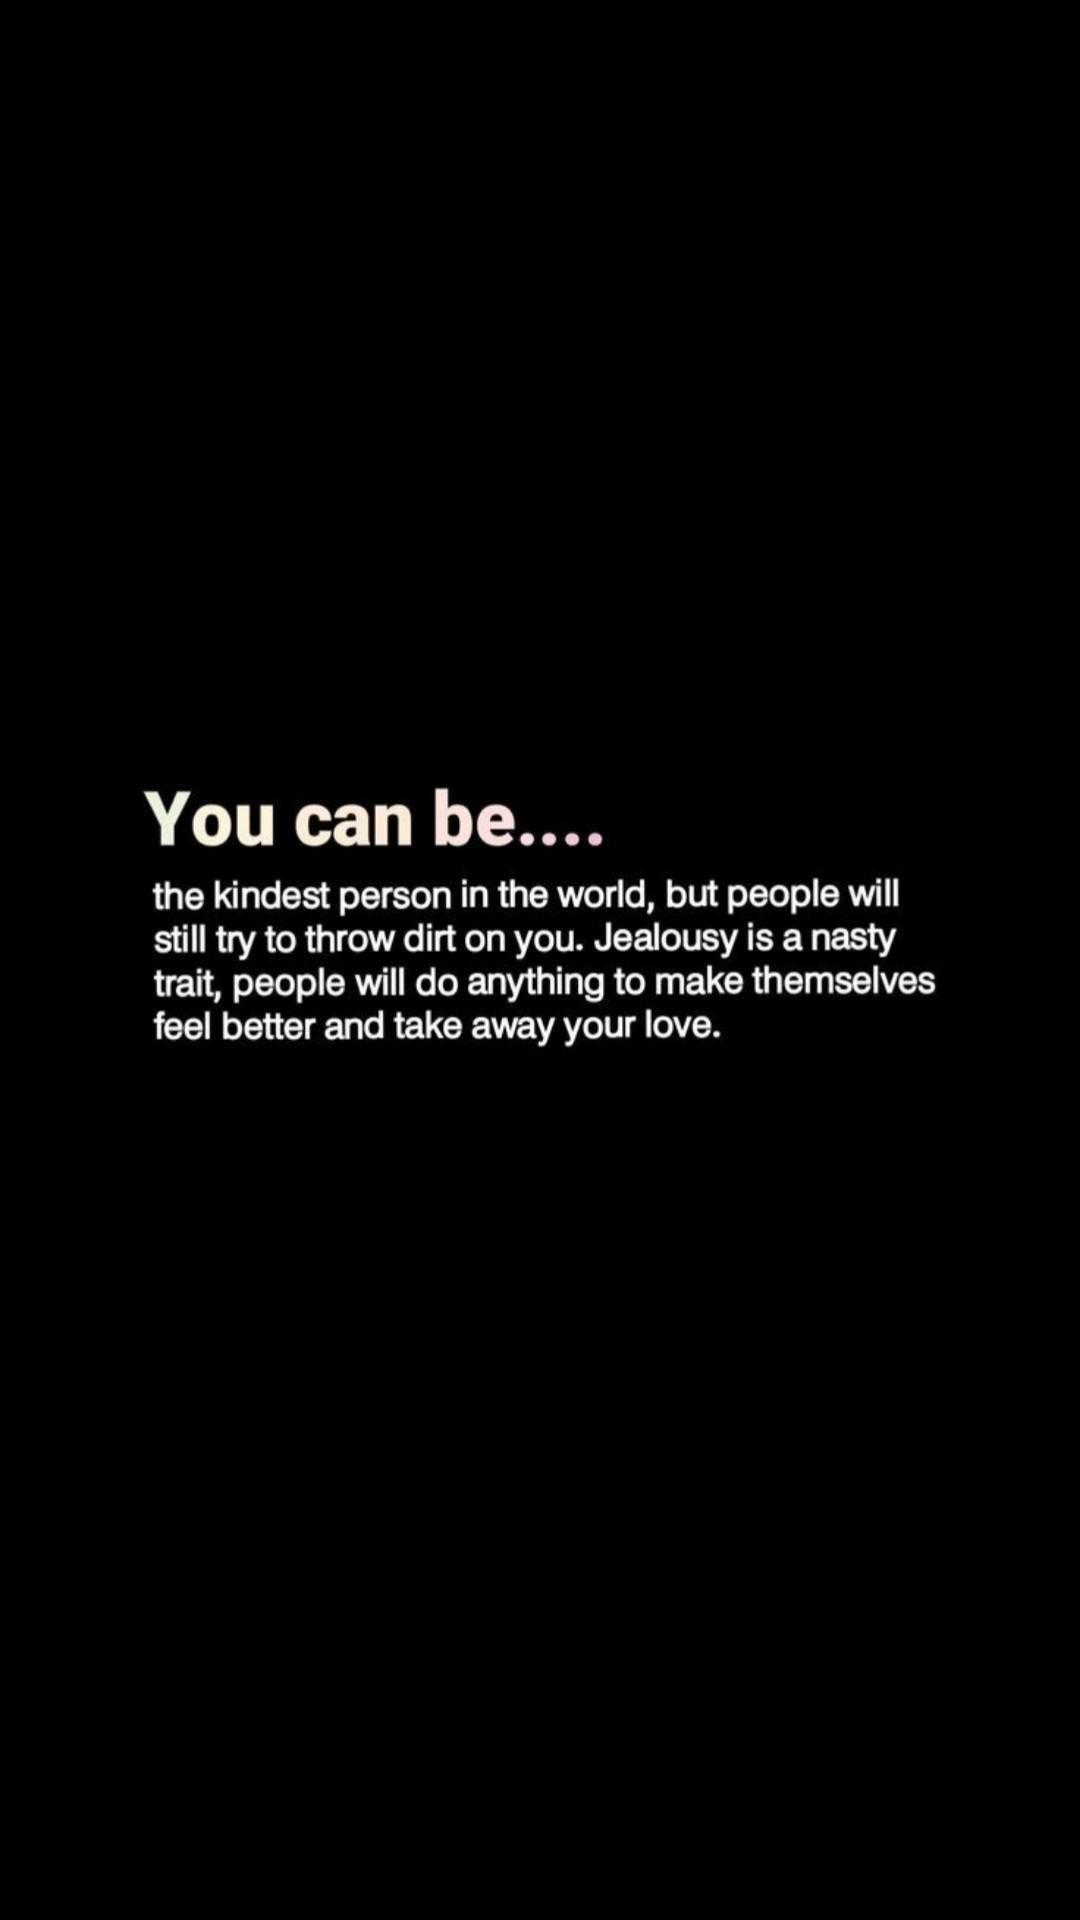 Wisdom for today 💛